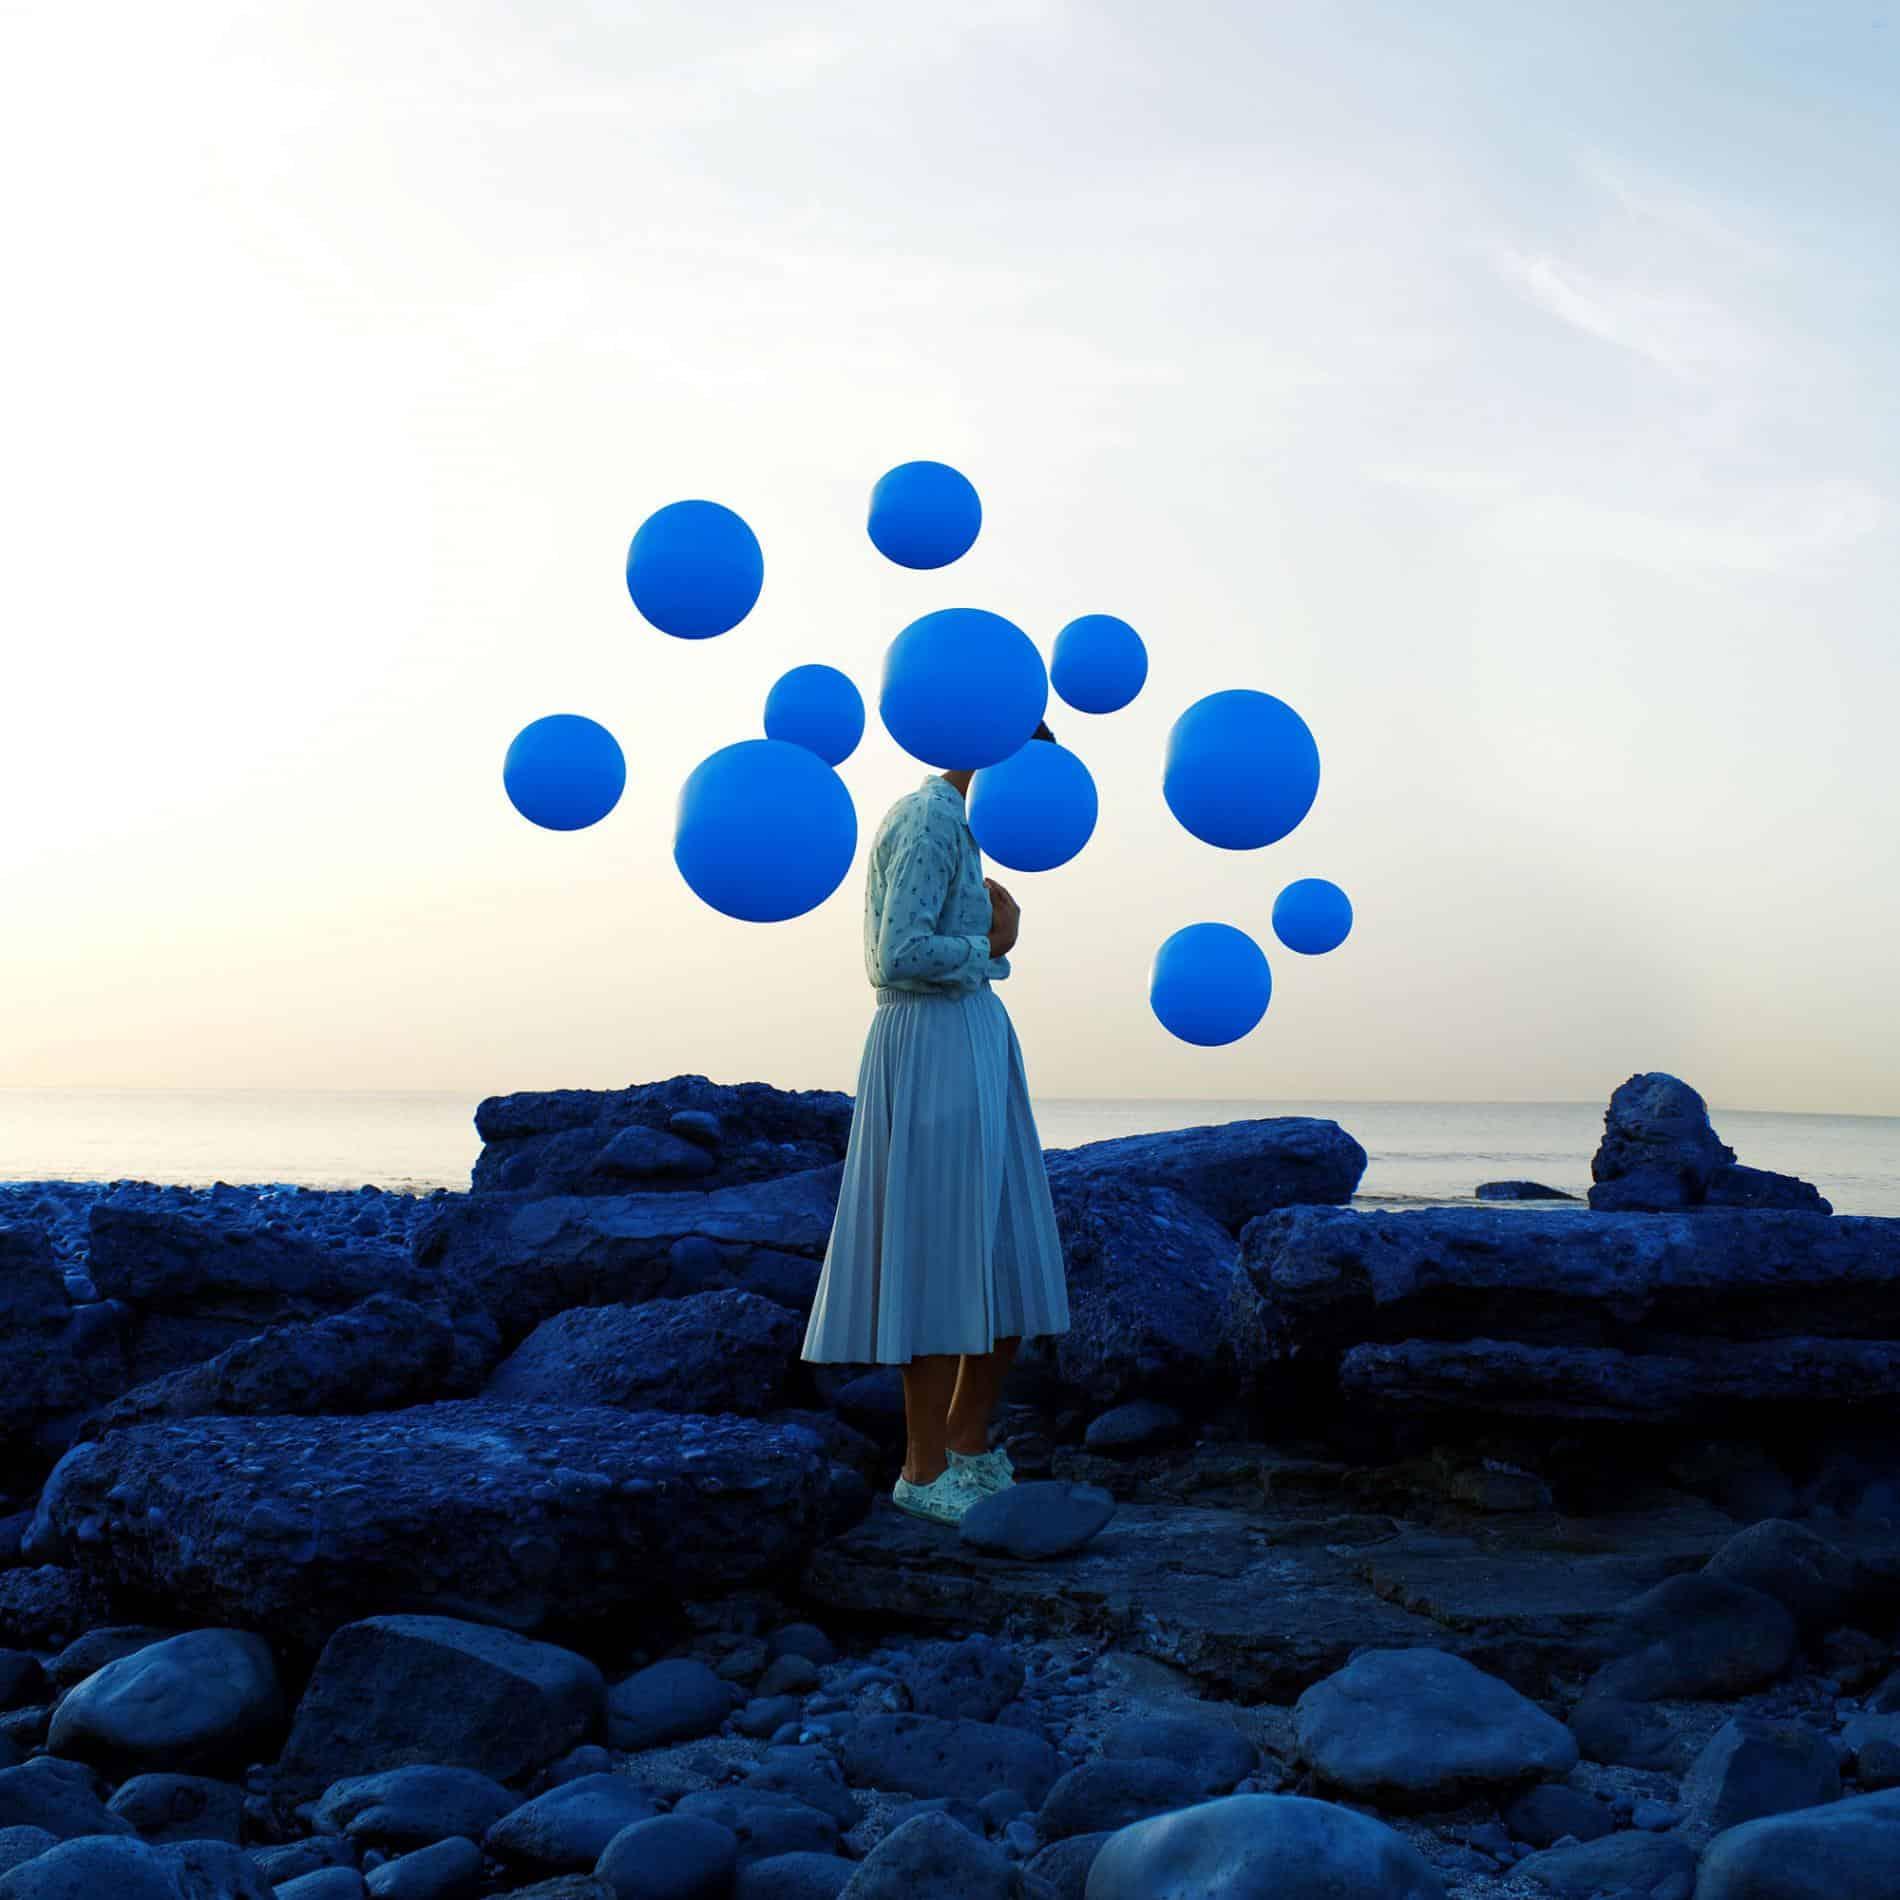 fares micue autoretrato globos blue